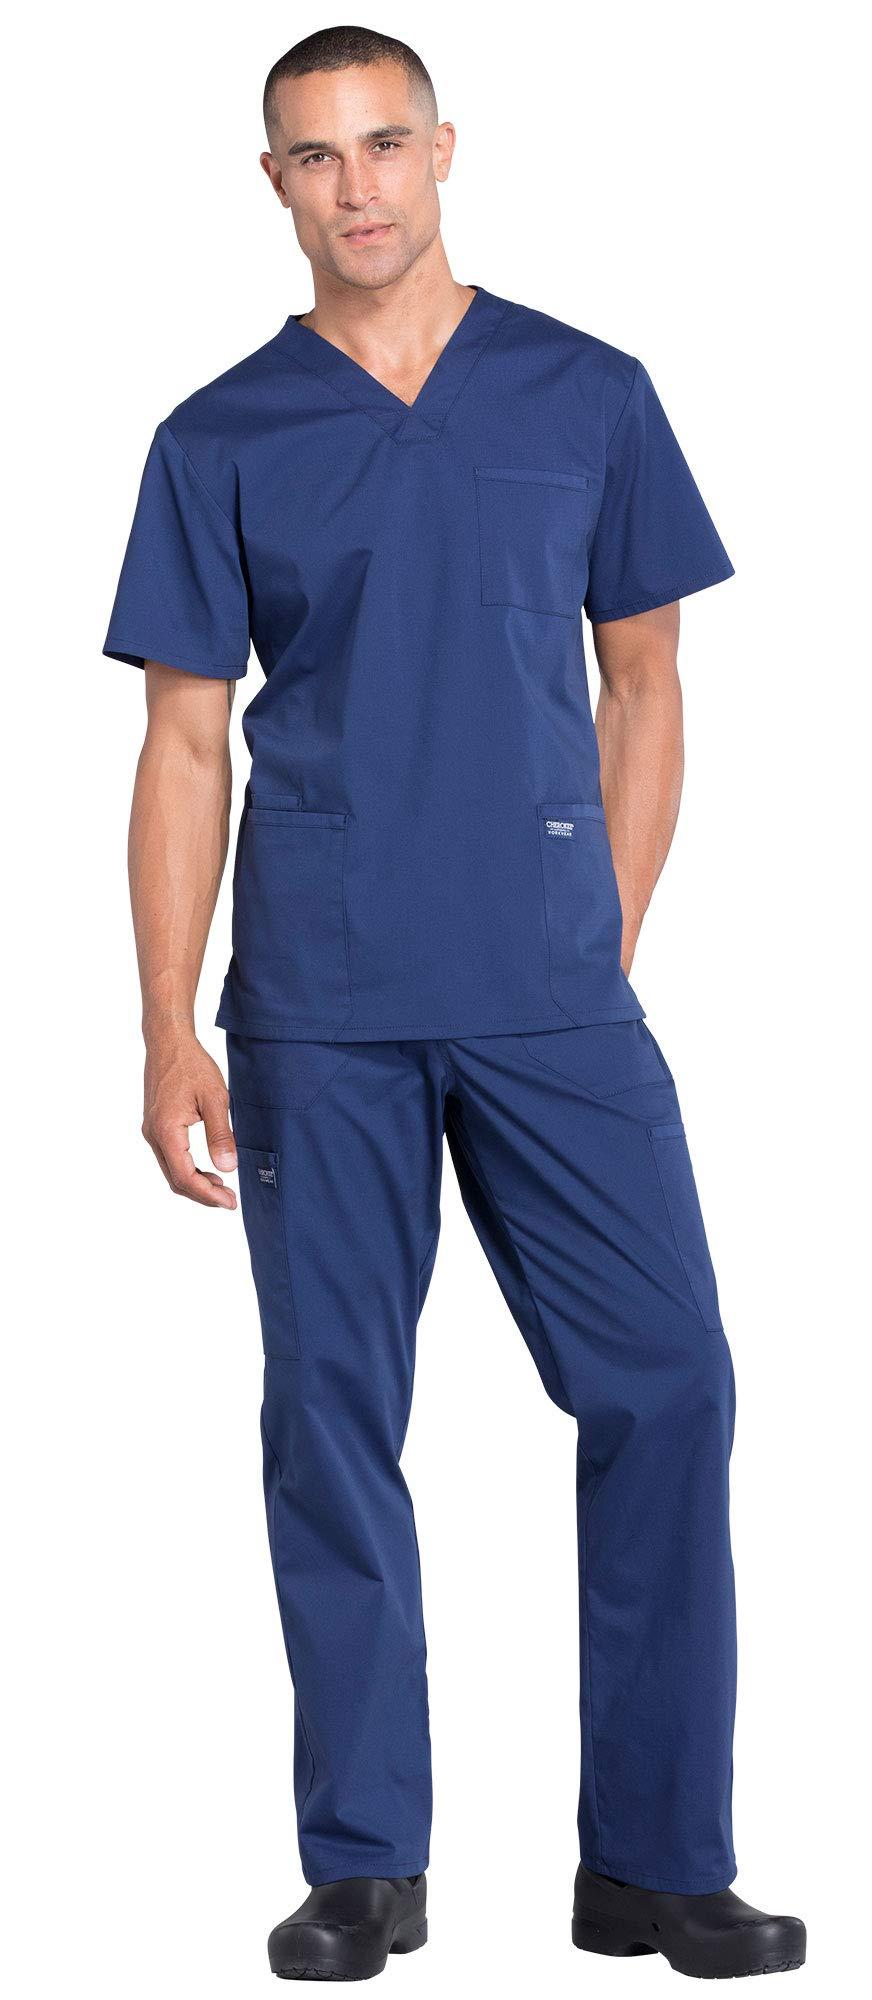 Cherokee Workwear Professionals Men's 4 Pocket V-Neck Scrub Top WW695 & Men's Drawstring Cargo Scrub Pants WW190 Medical Uniforms Scrub Set (Navy - X-Small)